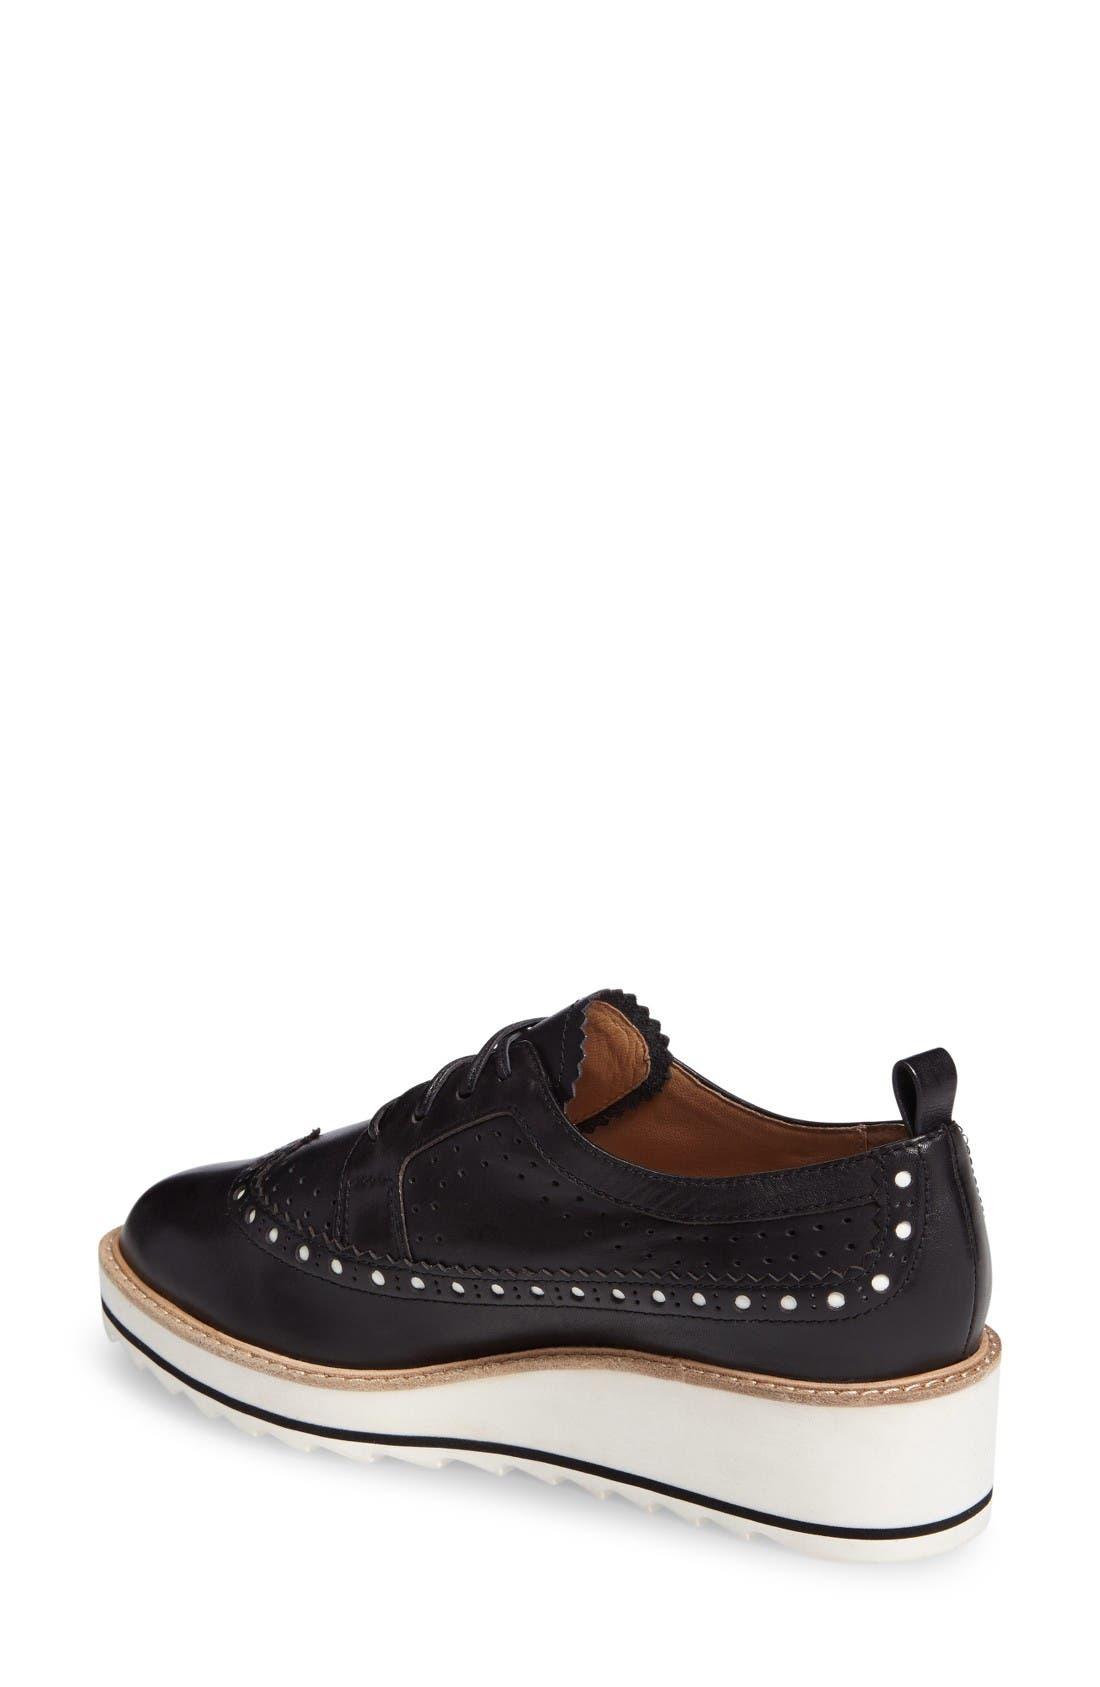 Malti Platform Wedge Oxford,                             Alternate thumbnail 2, color,                             Black Leather